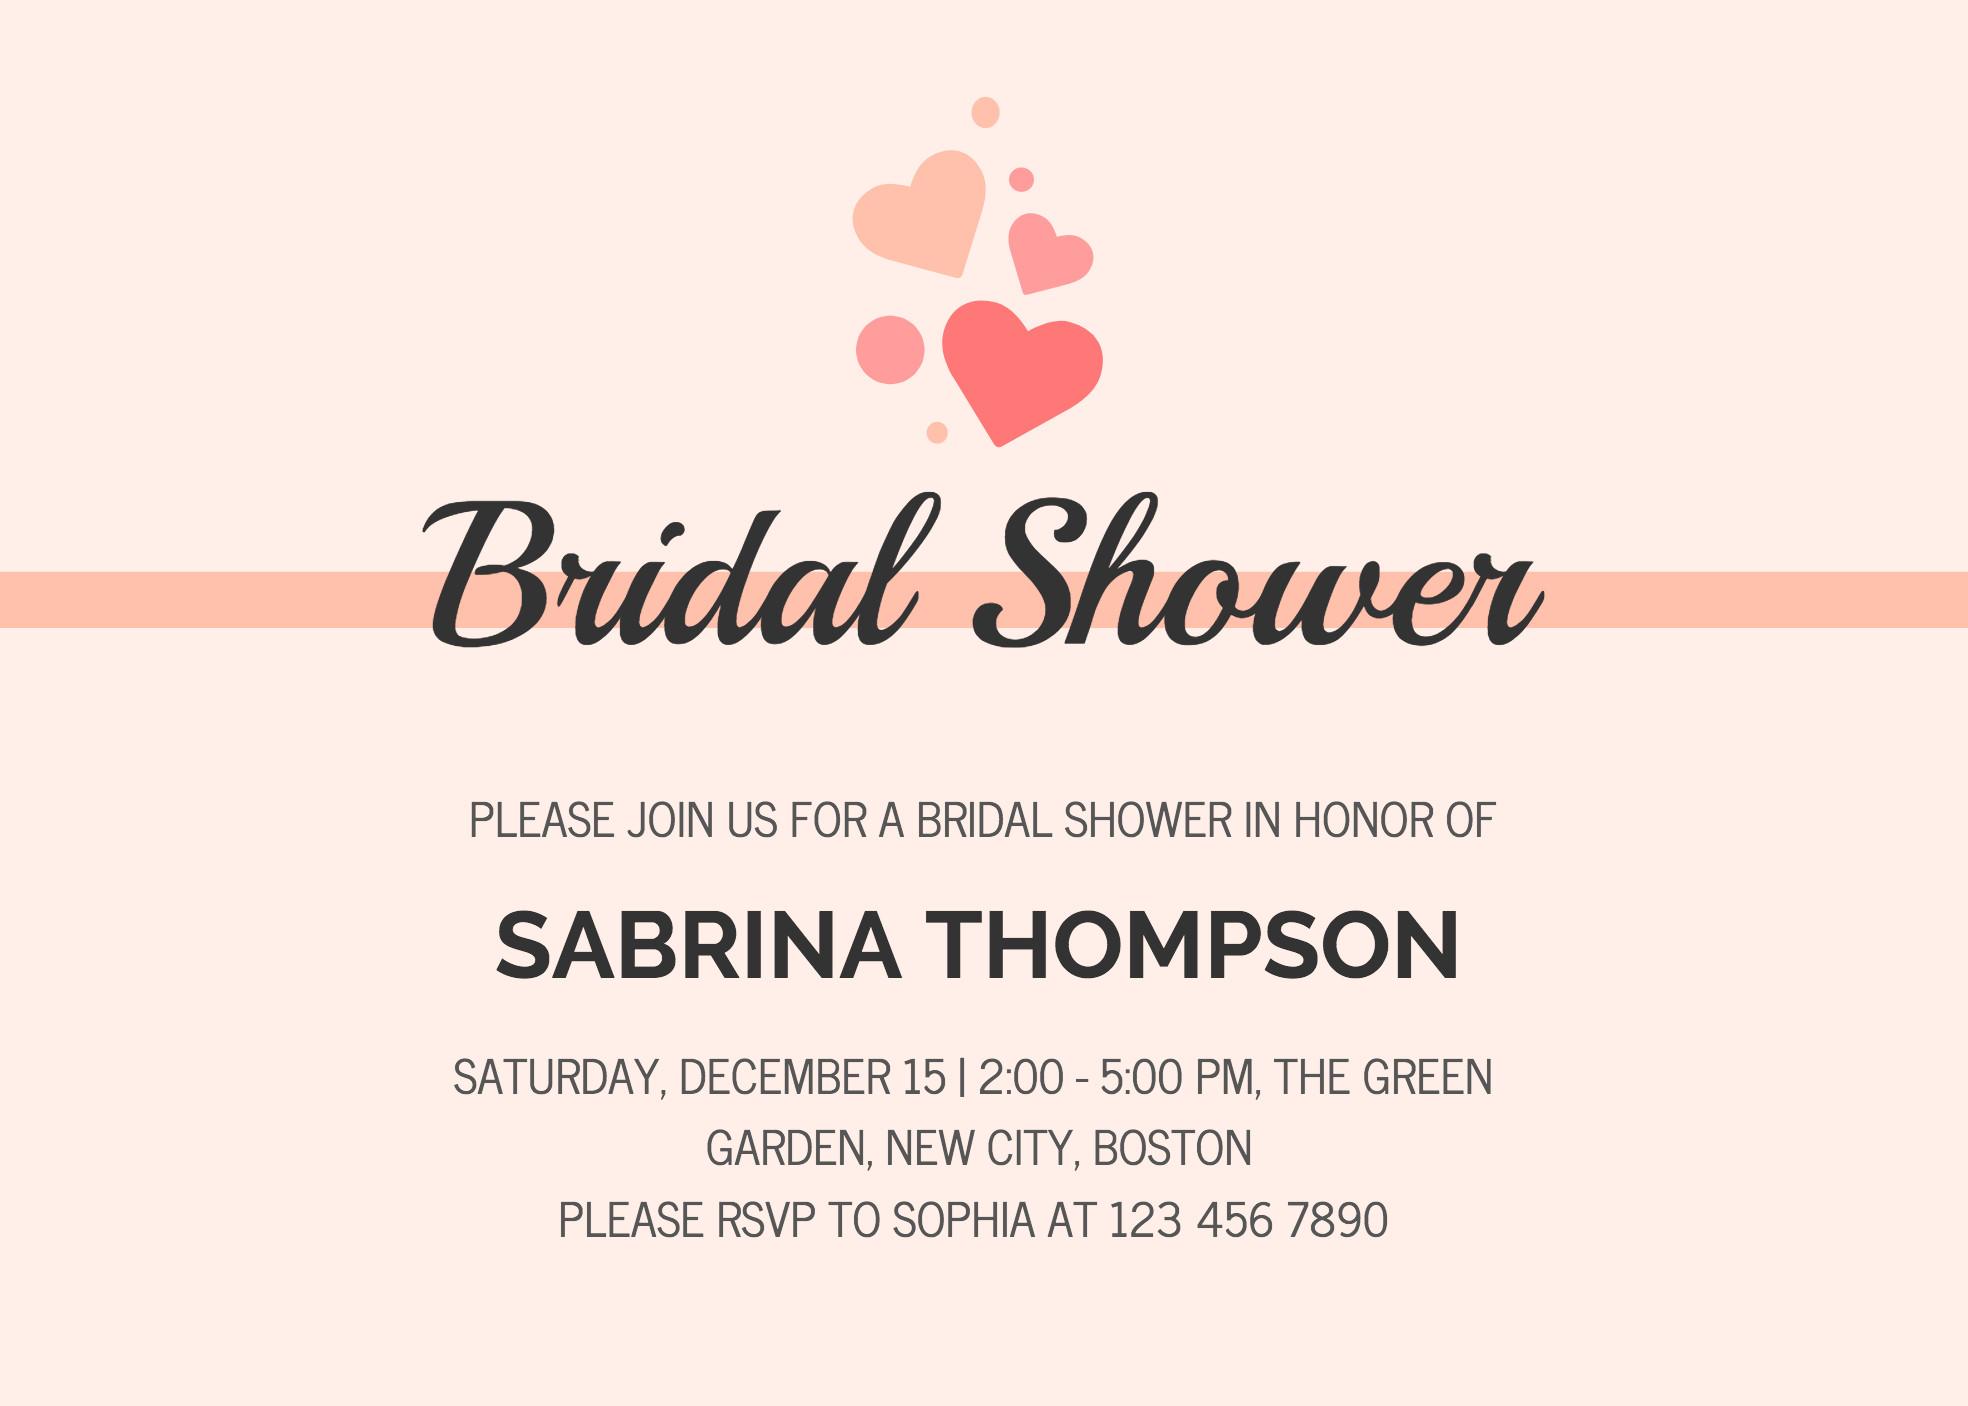 Wedding Shower Invitation Templates 19 Diy Bridal Shower and Wedding Invitation Templates